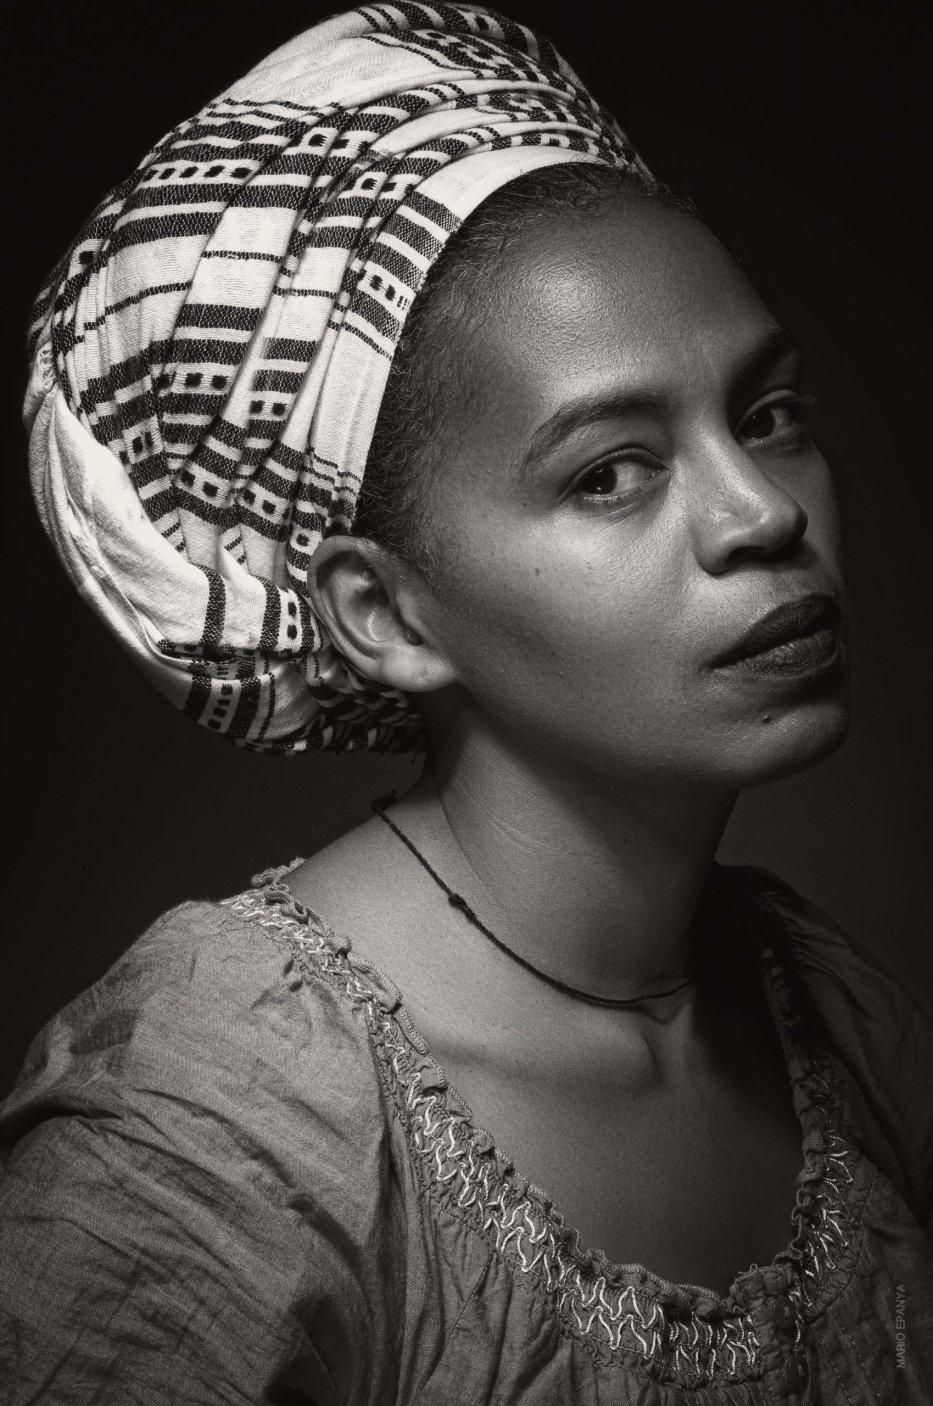 Ethiopian artist Aïda Muluneh